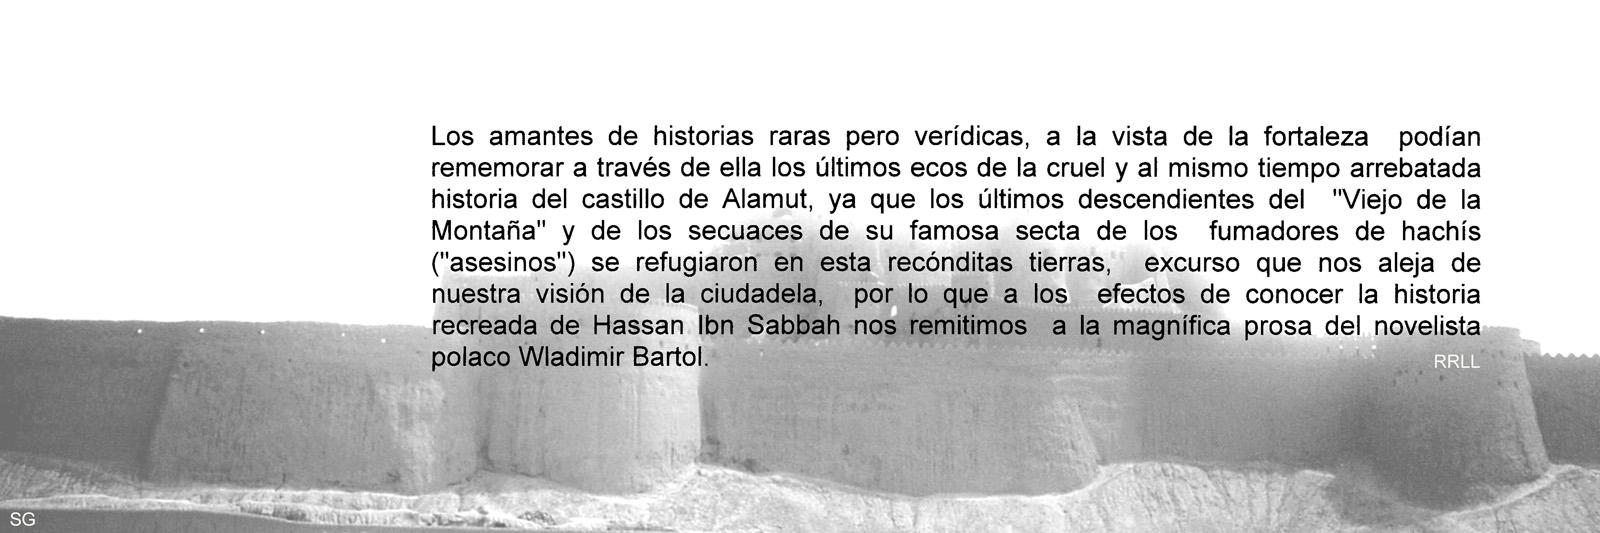 danielvillalobos-architecturalexhibition-bam-architectureofmud-70